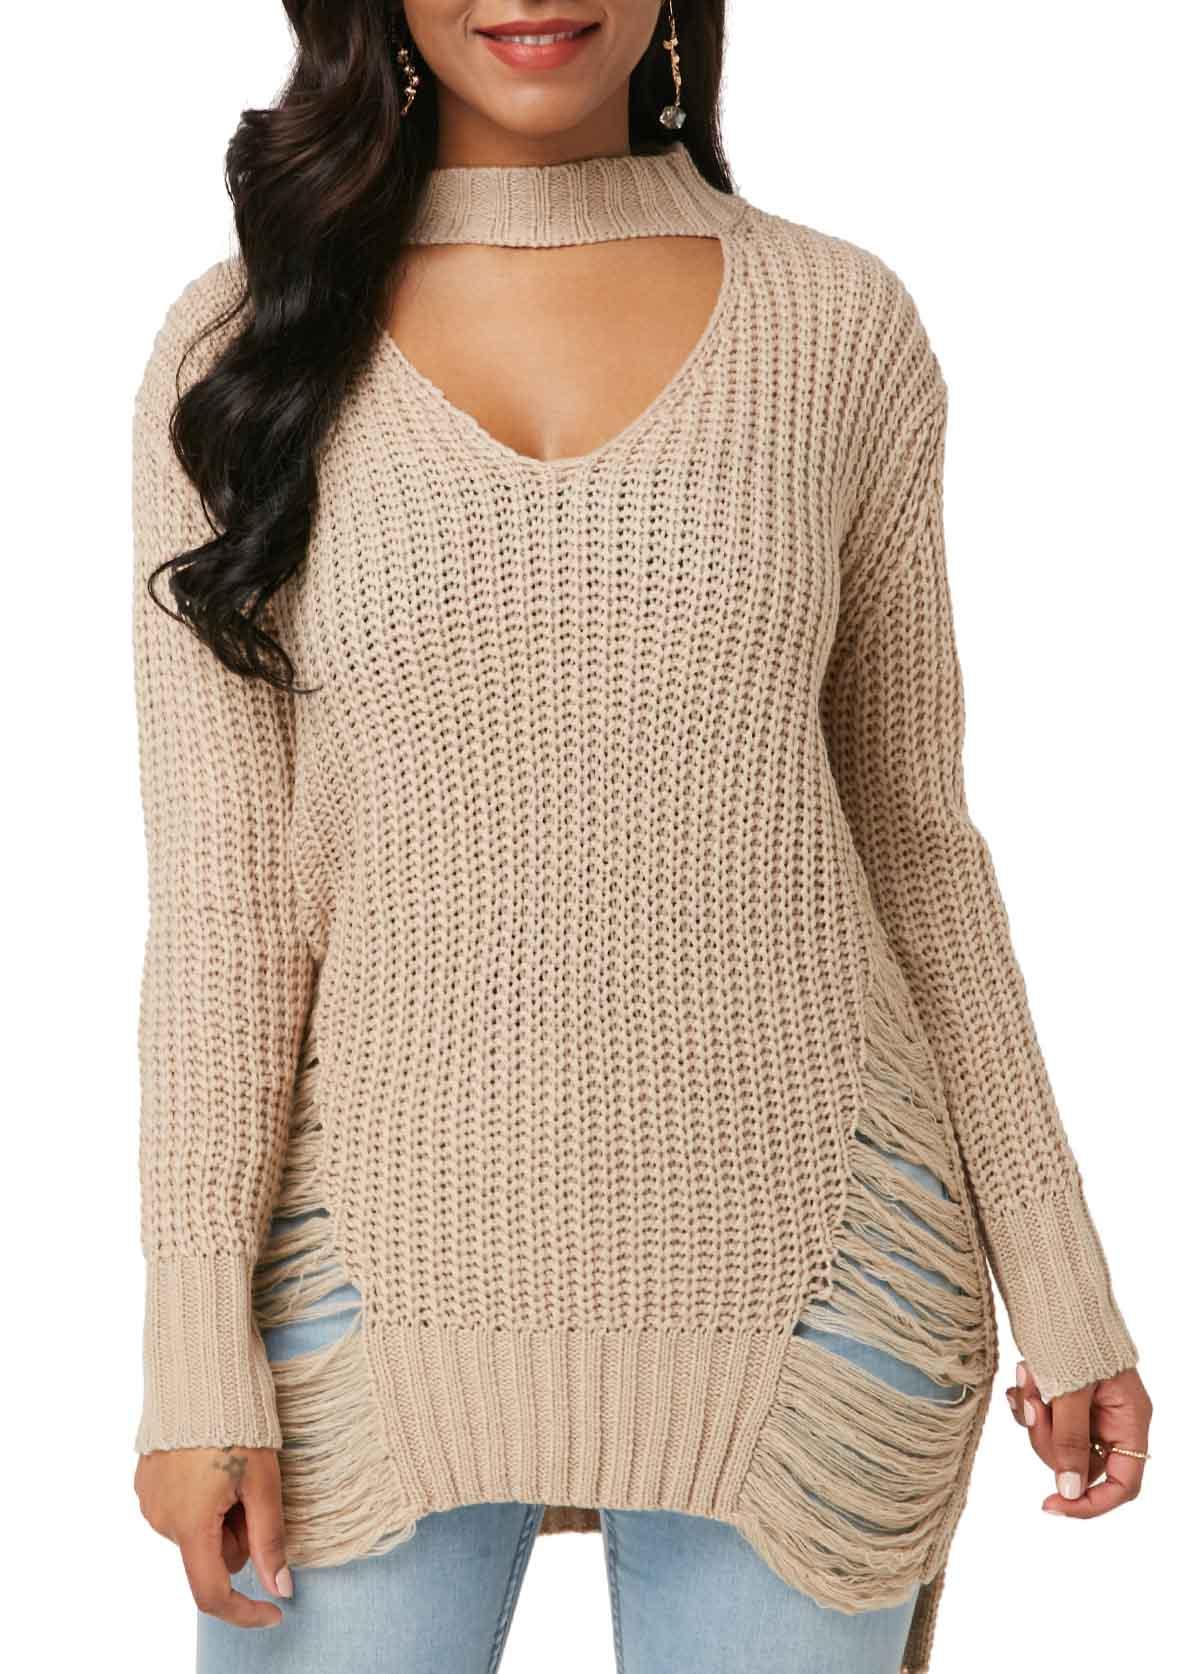 Choker Neck Long Sleeve Pullover Sweater